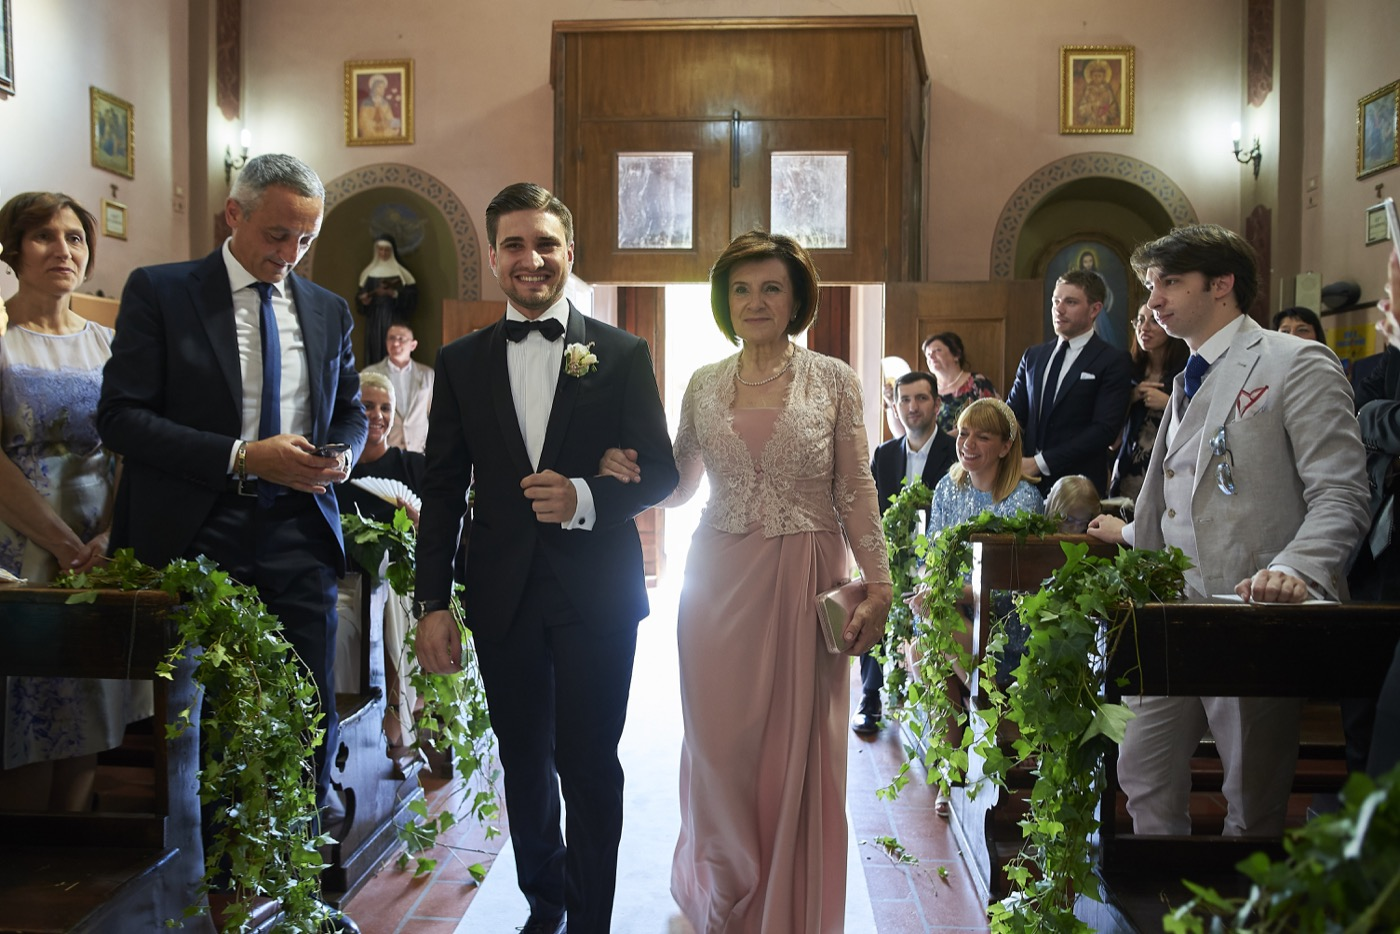 Claudio-Coppola-wedding-photographer-abbazia-7-frati-piegaro-23